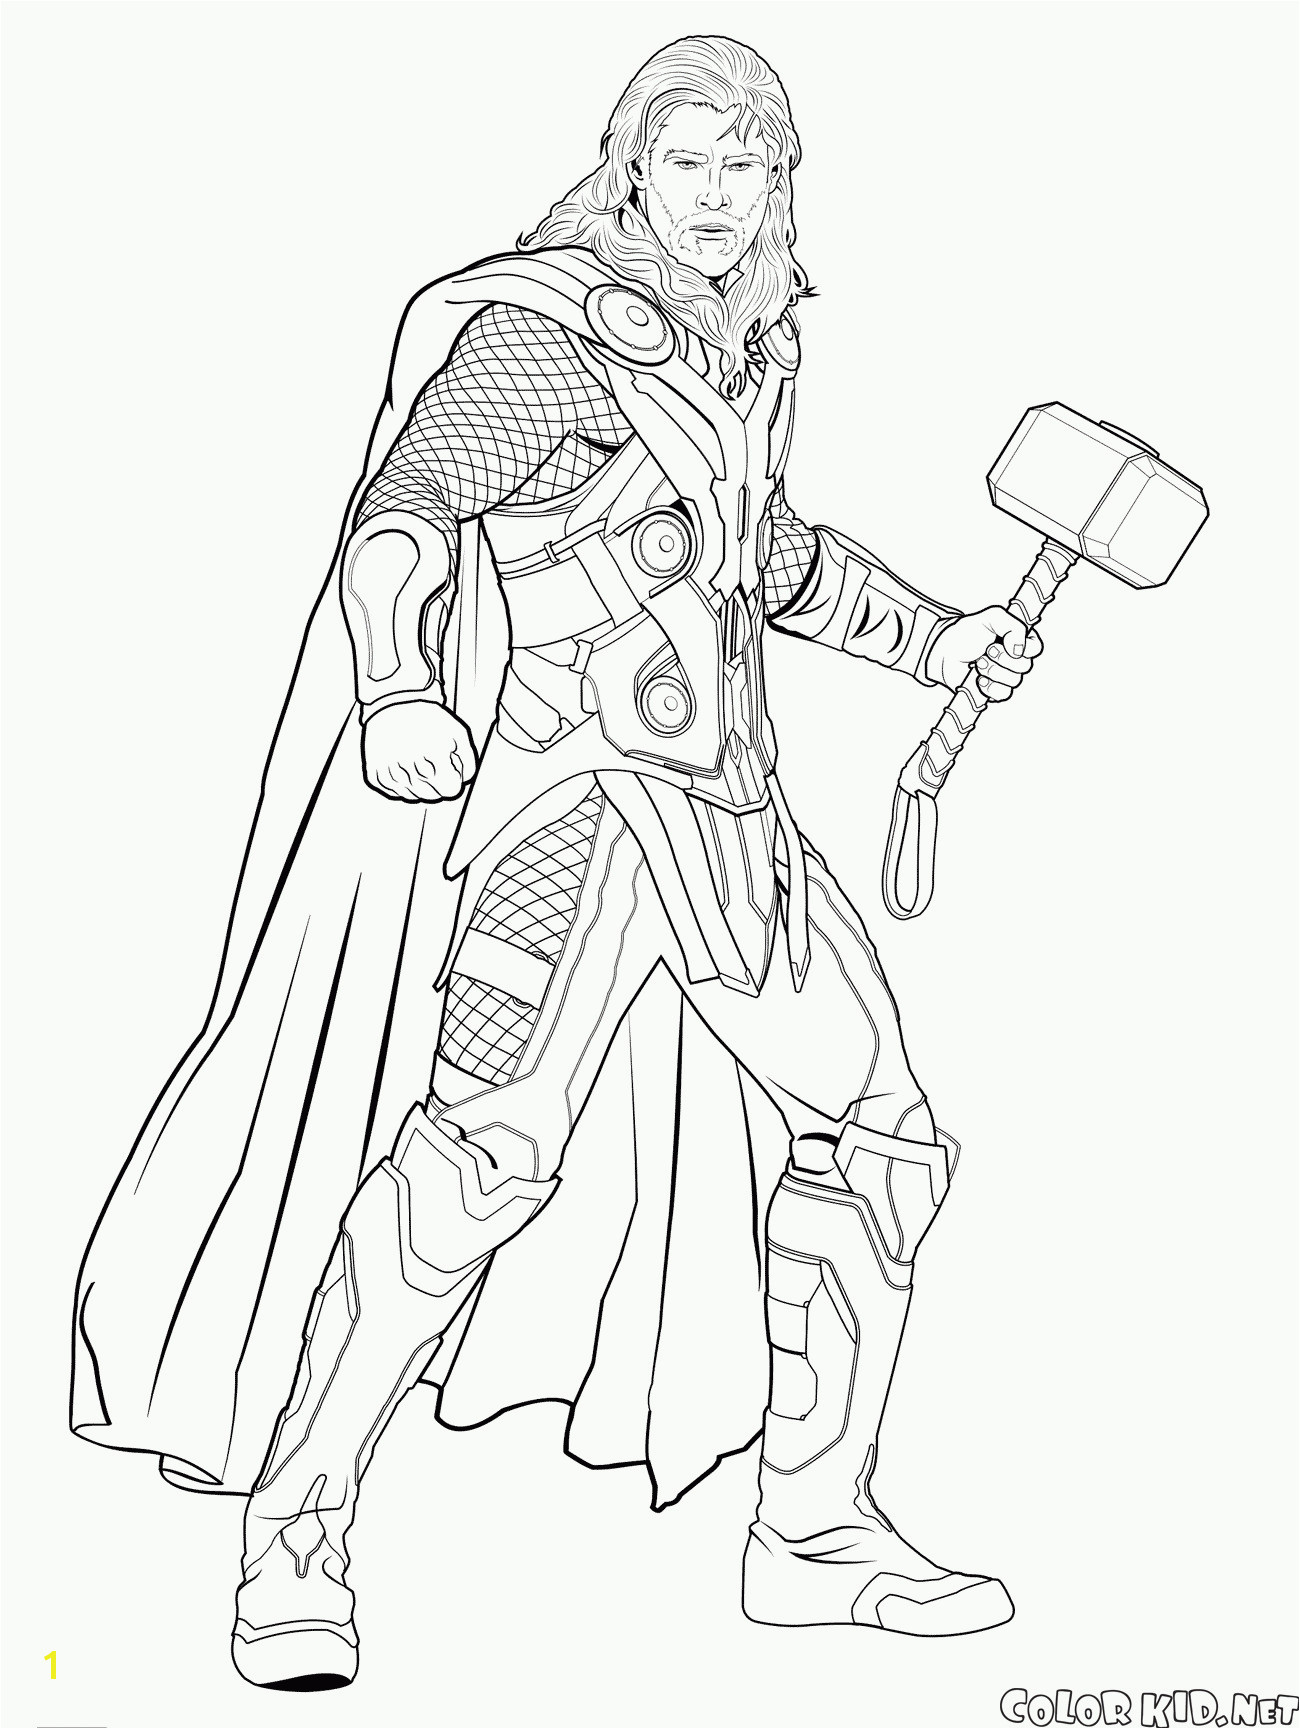 Coloring Page Black Widow Genial Thor Ausmalbilder